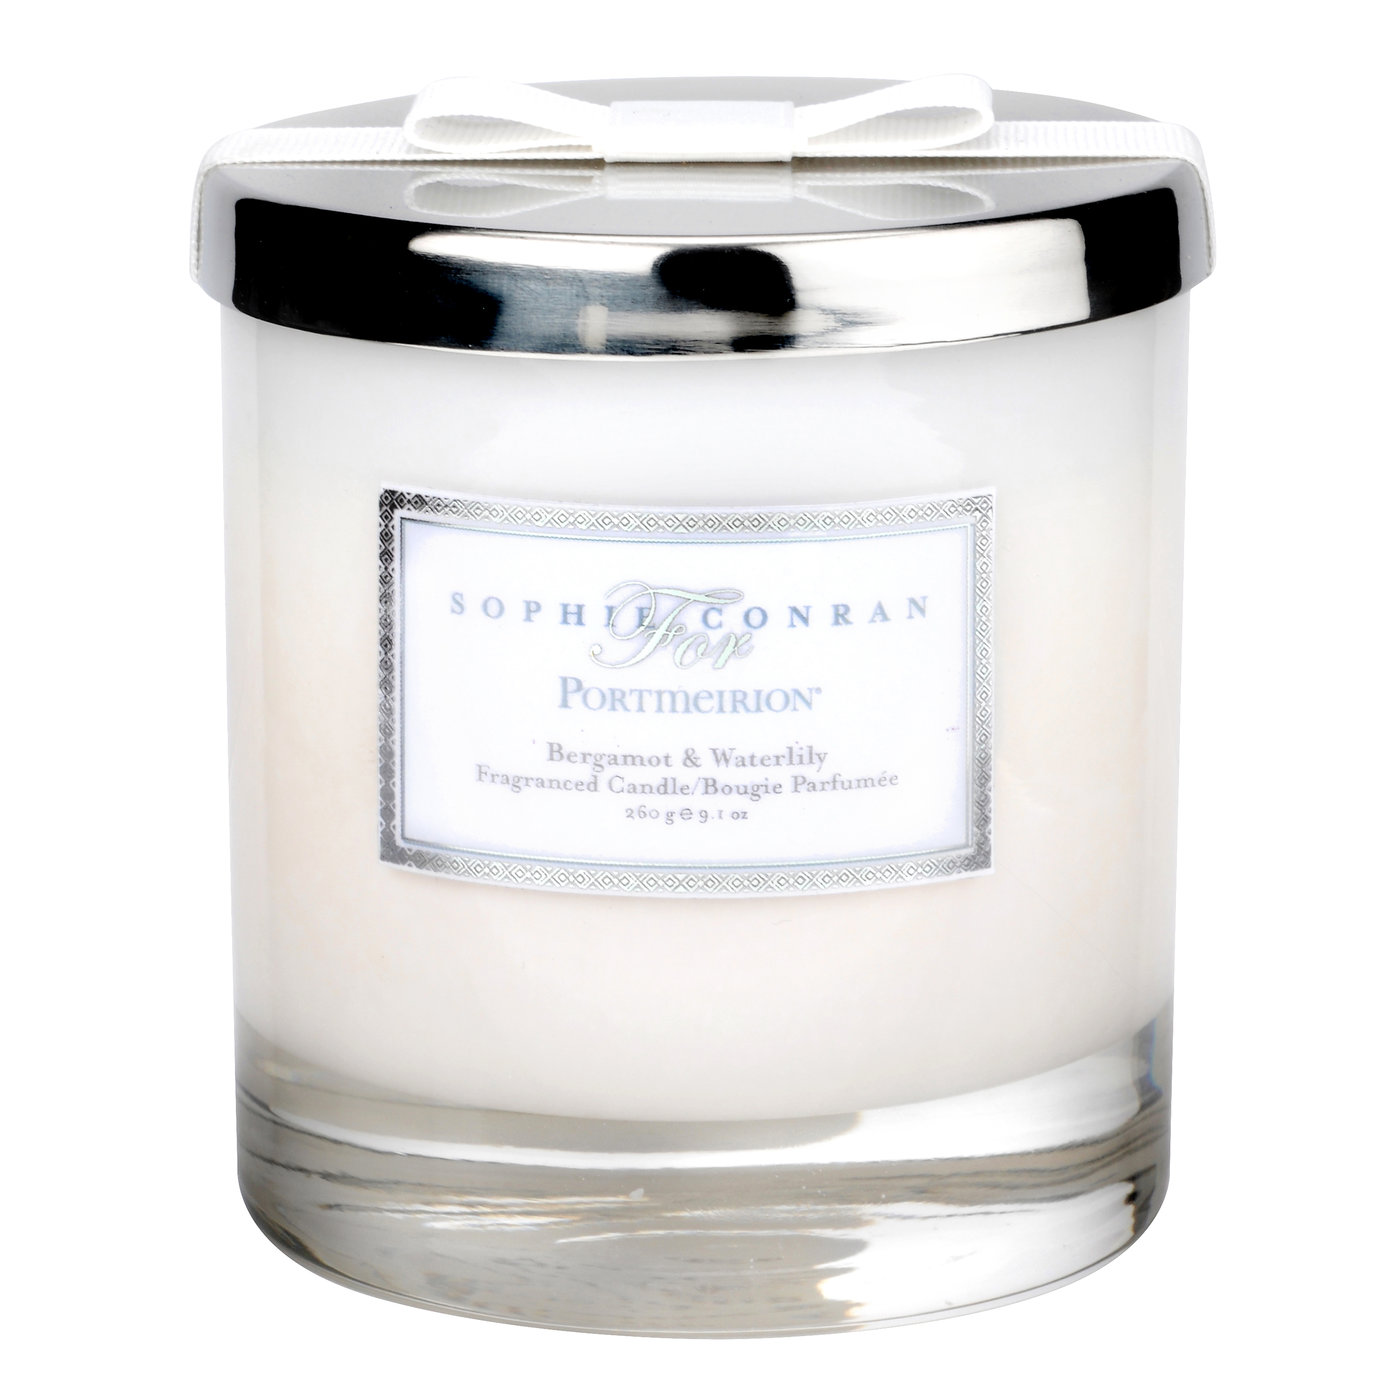 Sophie Conran Fragrance Collection